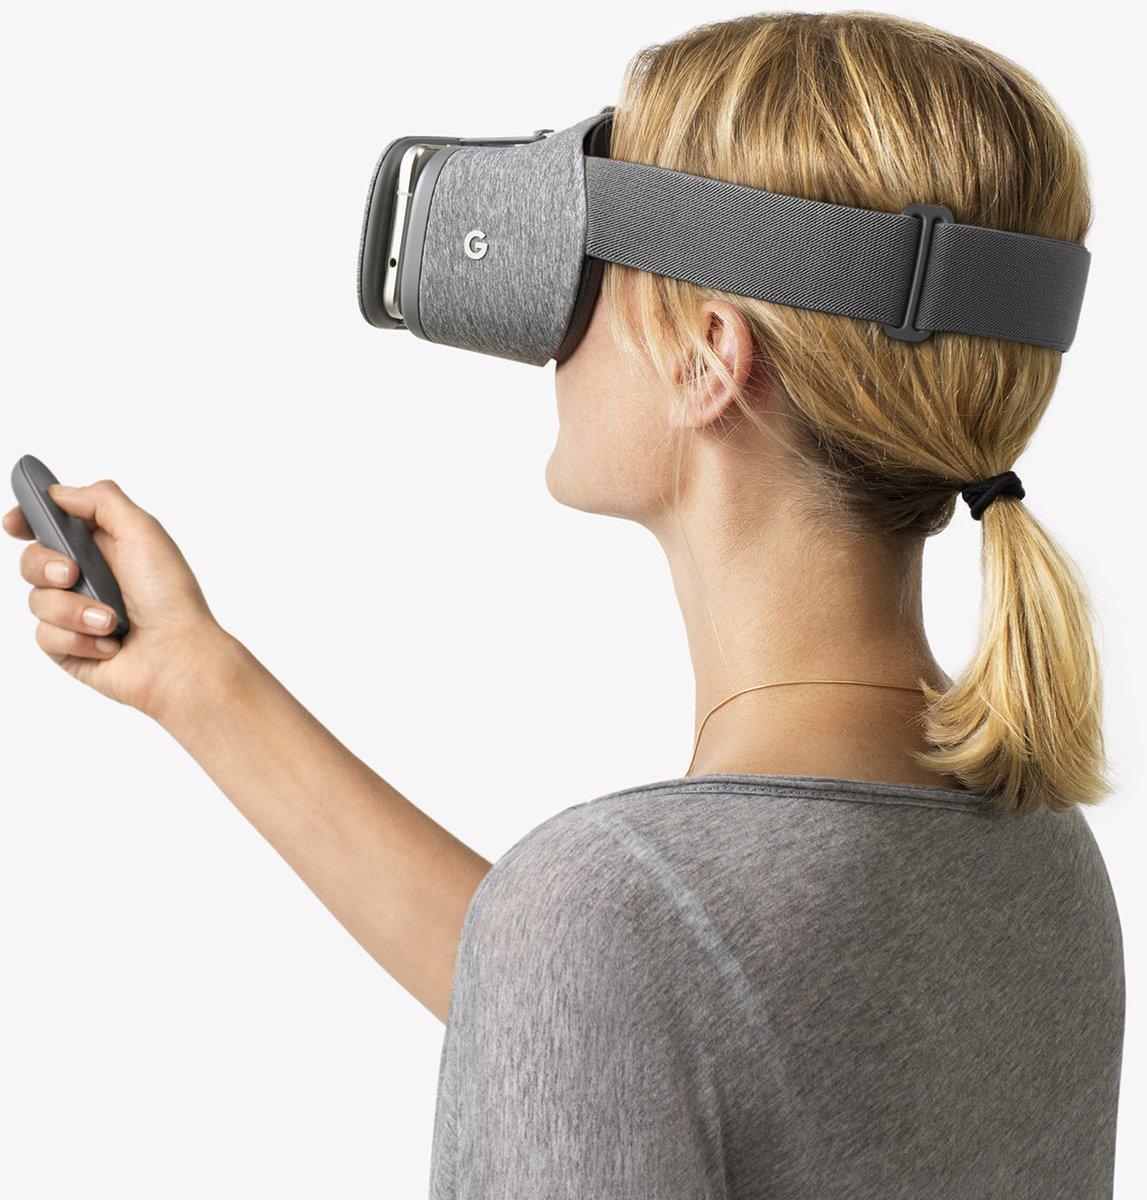 Daydream View VR头盔11月10日上市